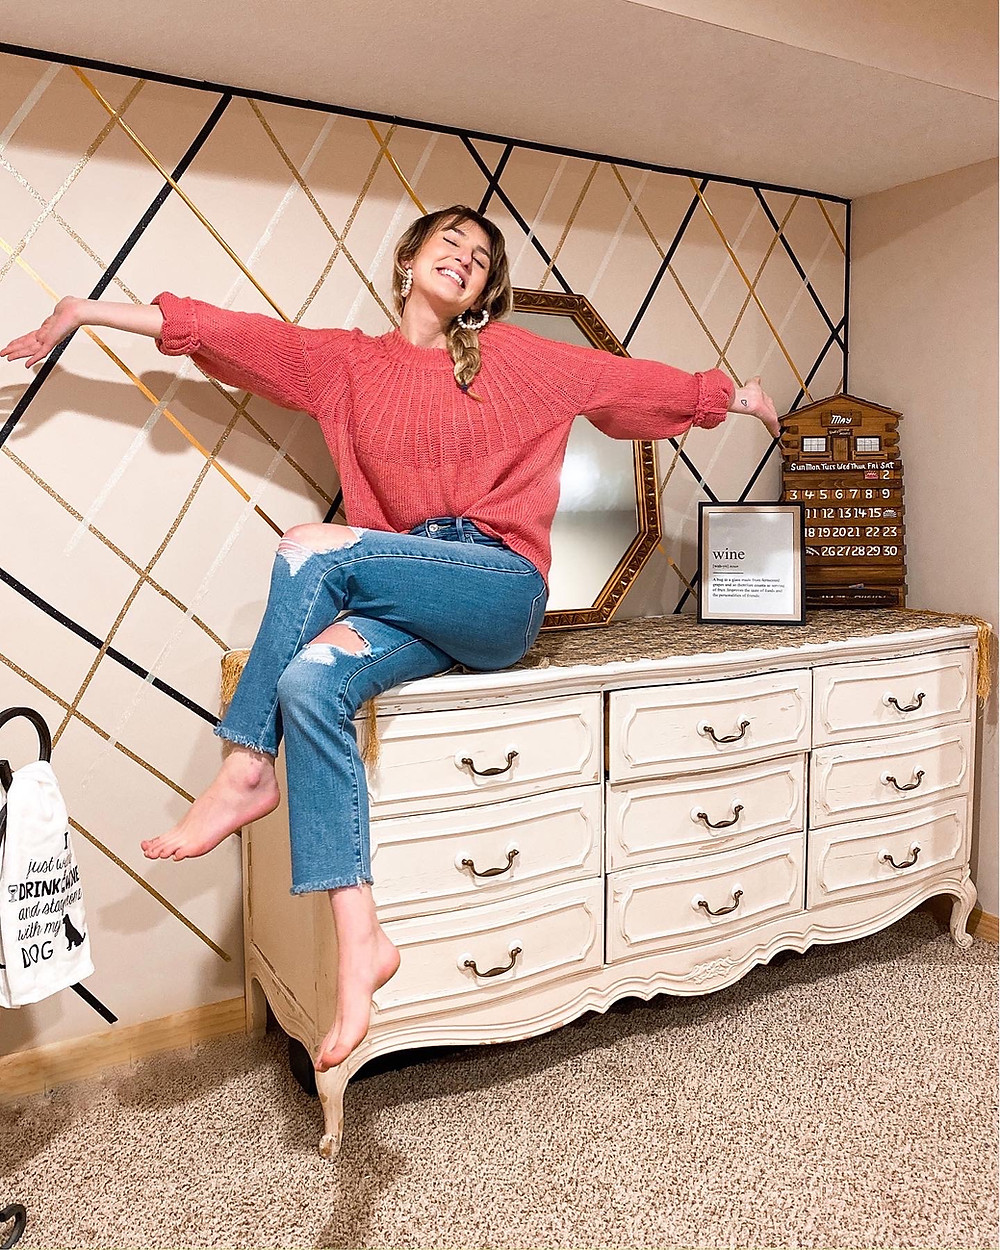 Abby Graf, The Bleached Curl, DIY wall